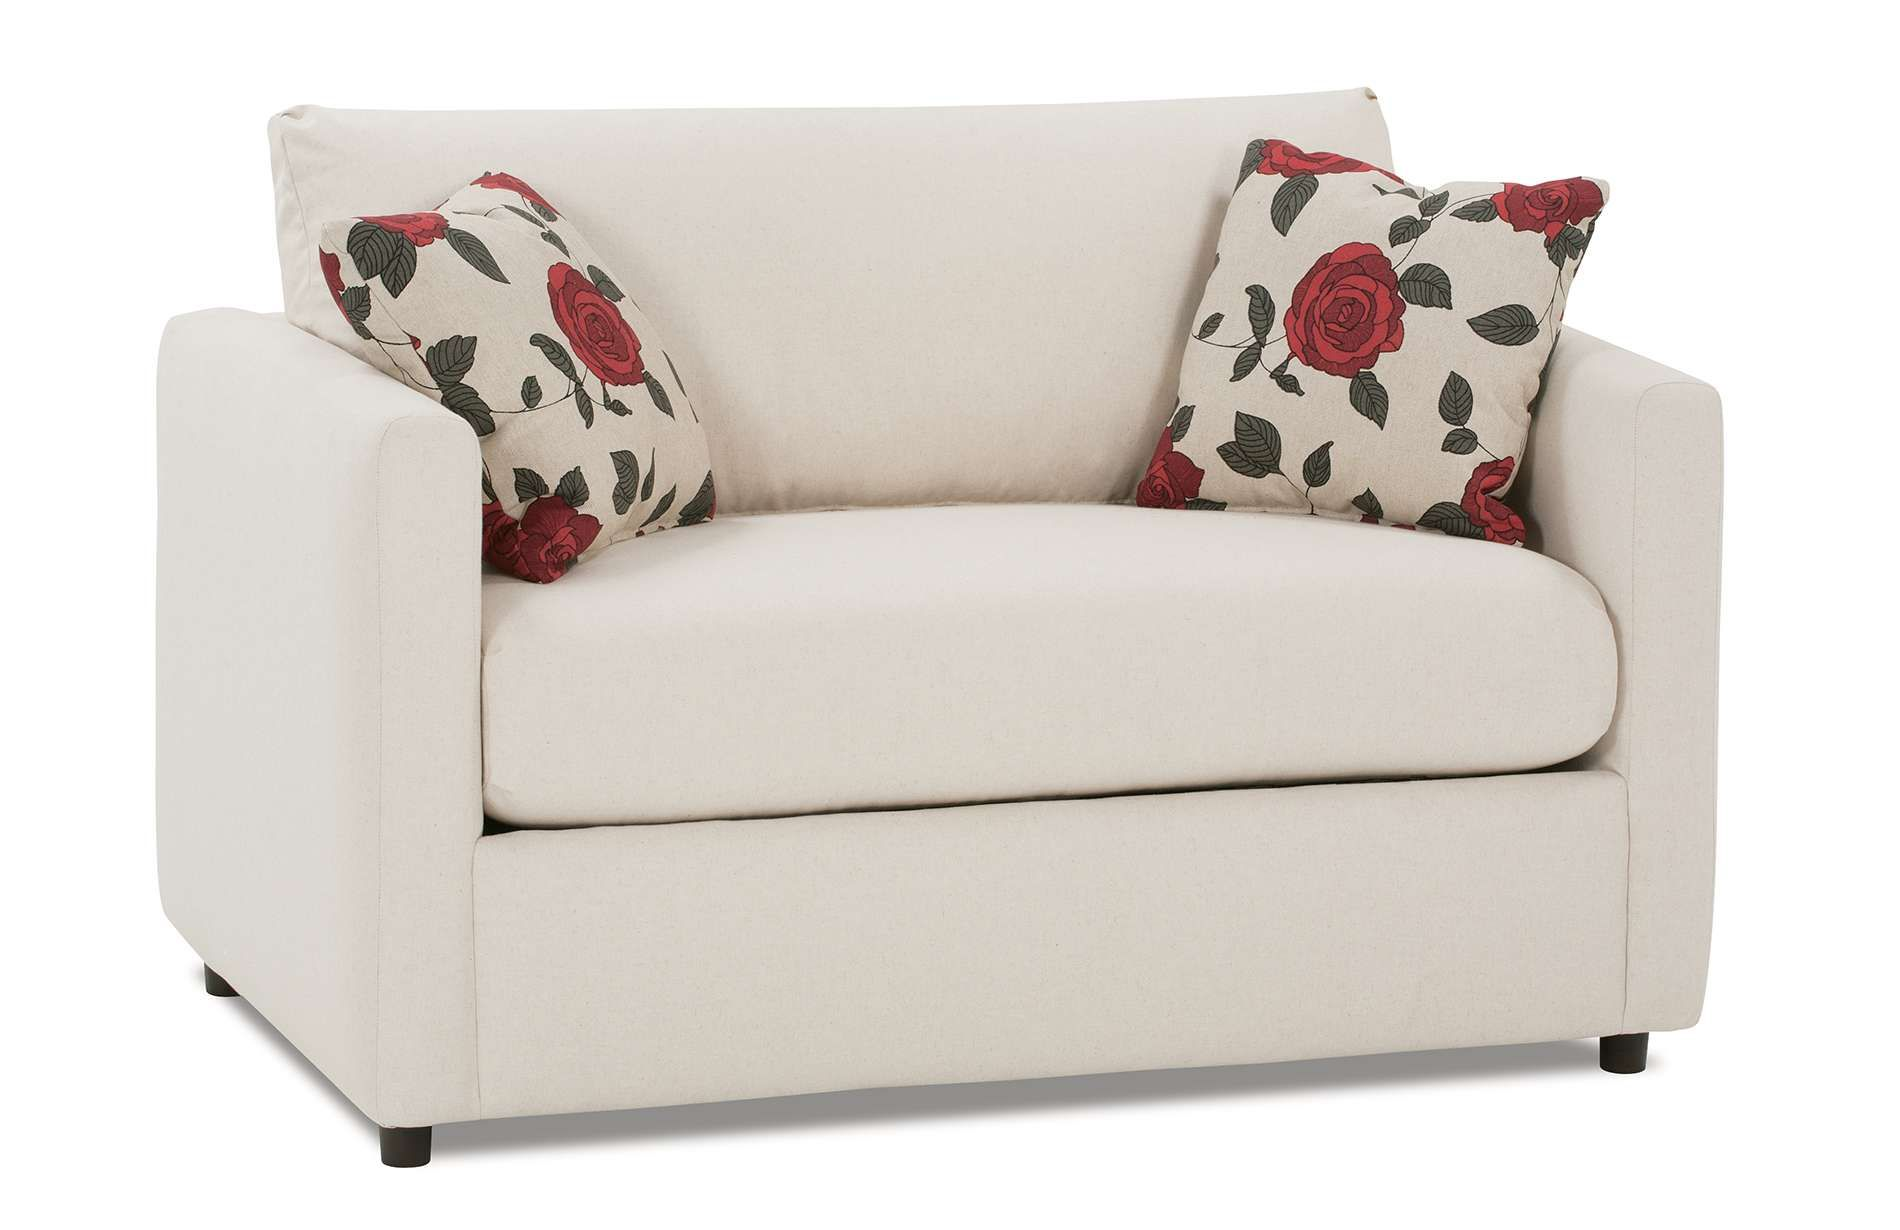 Stockdale Twin Sleeper Sofa Rowe Furniture Living room furniture